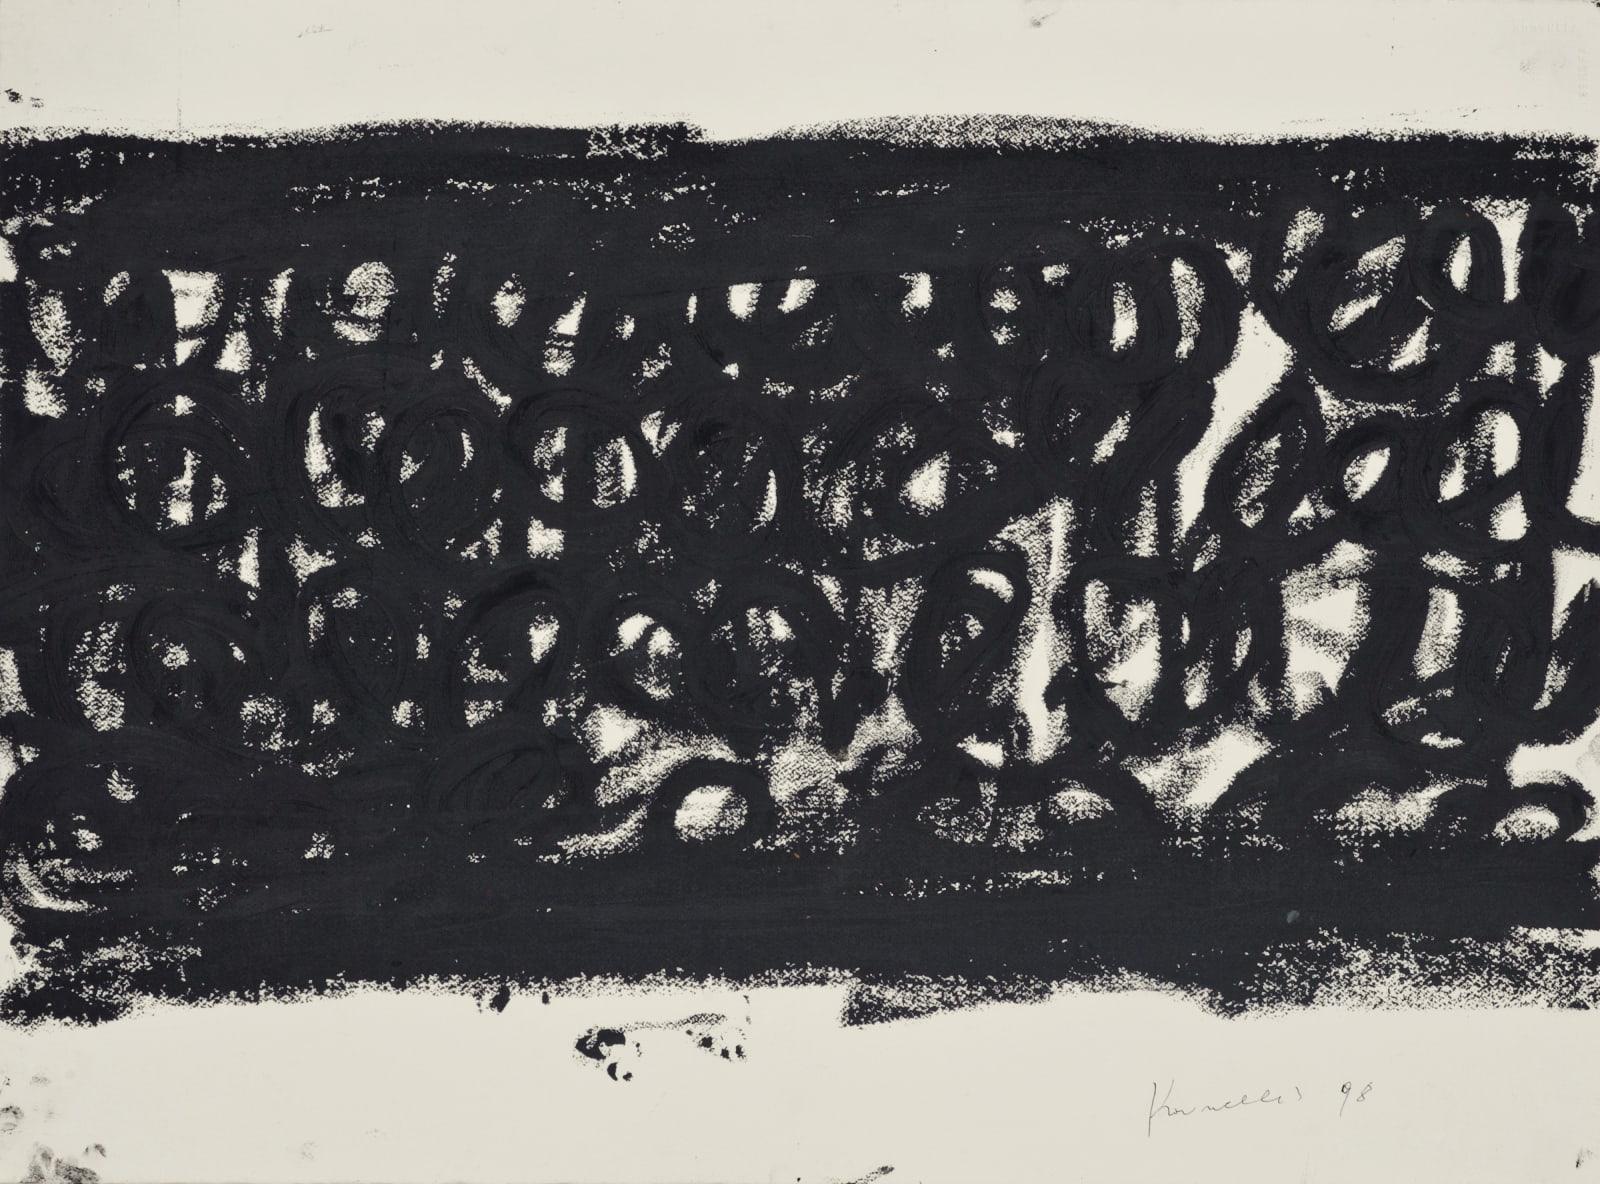 Jannis Kounellis Untitled VI, 1998